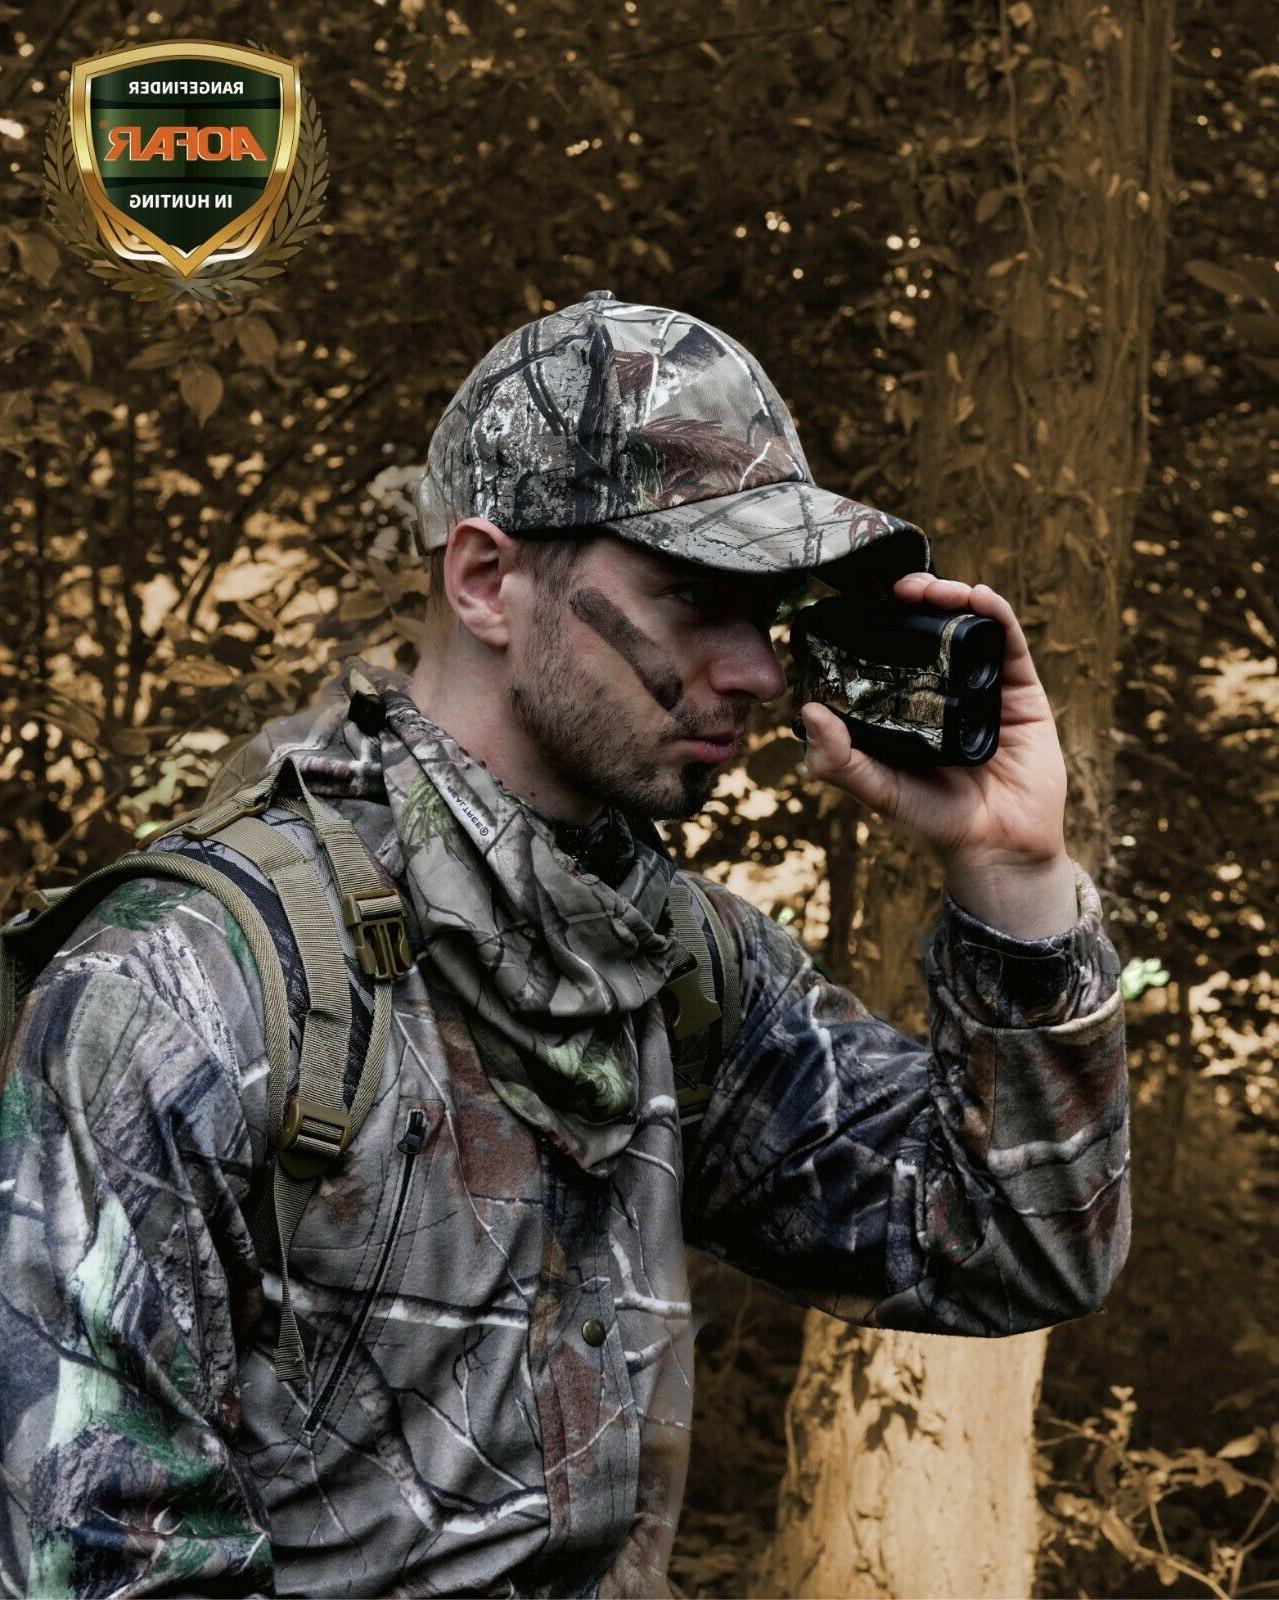 AOFAR Laser Finder for Bow Archery Waterproof